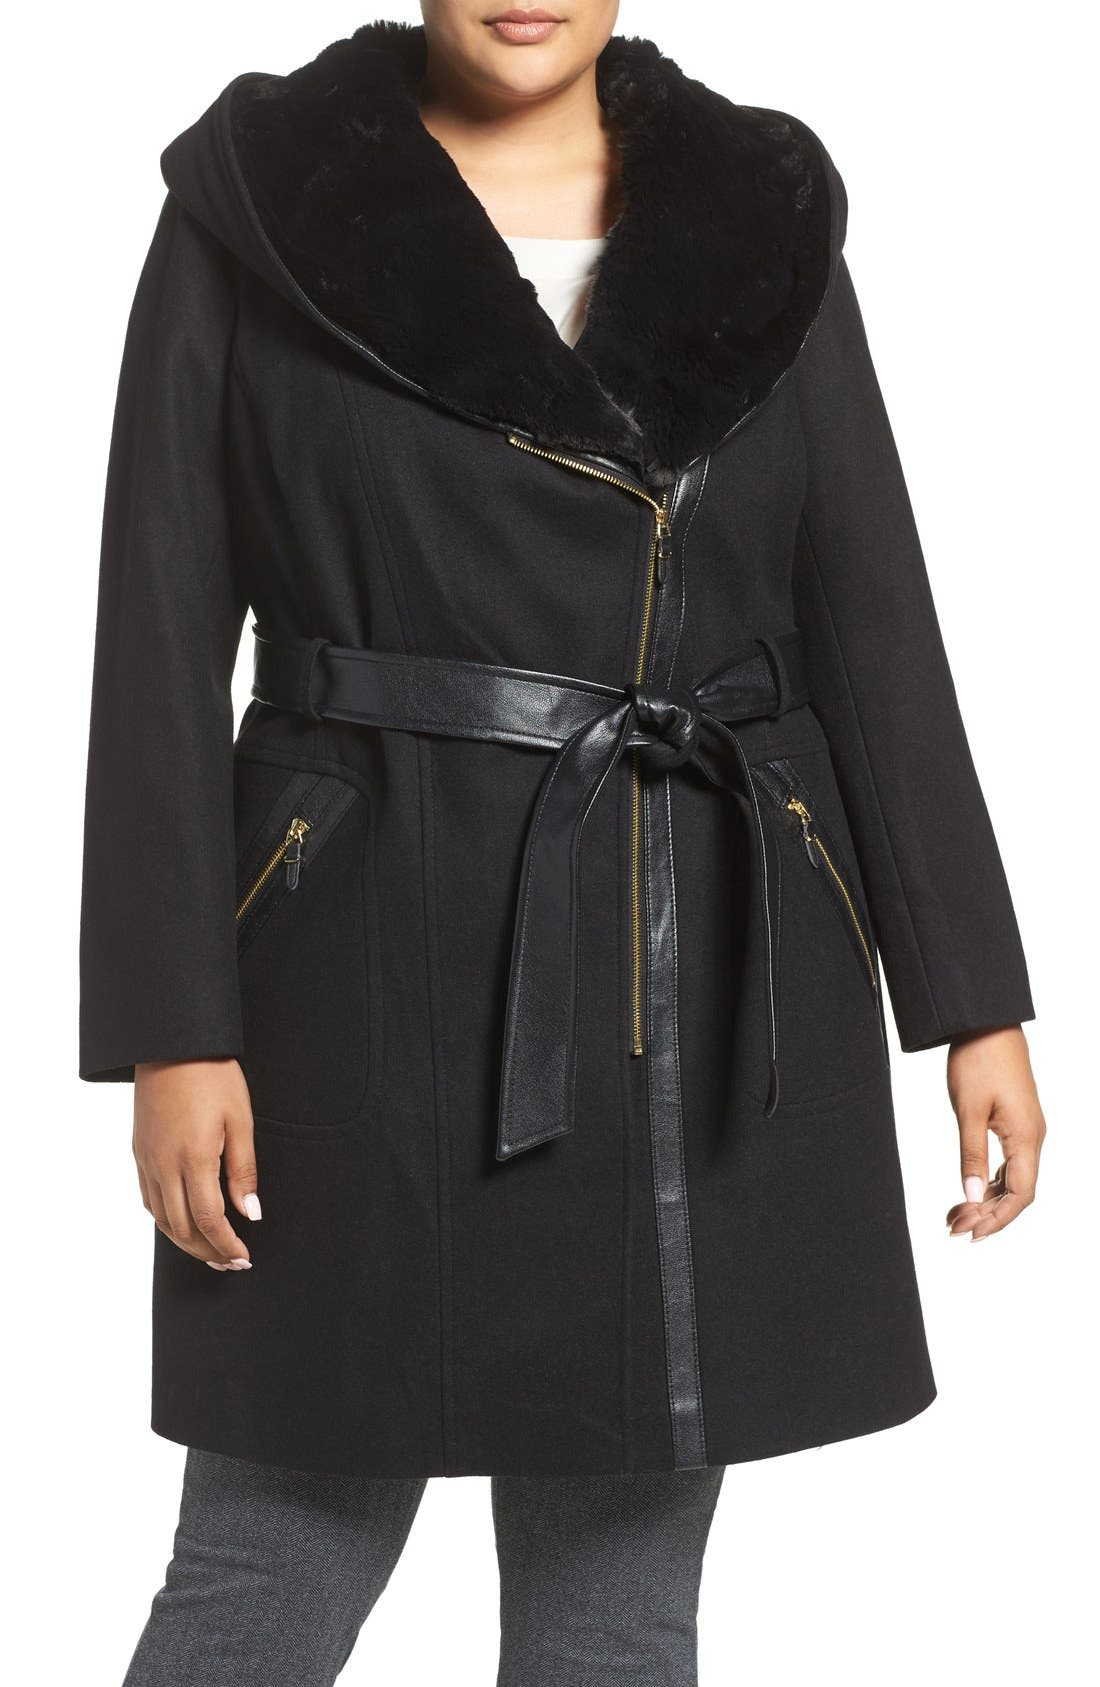 Via Spiga Wool Blend Coat with Faux Fur Trim